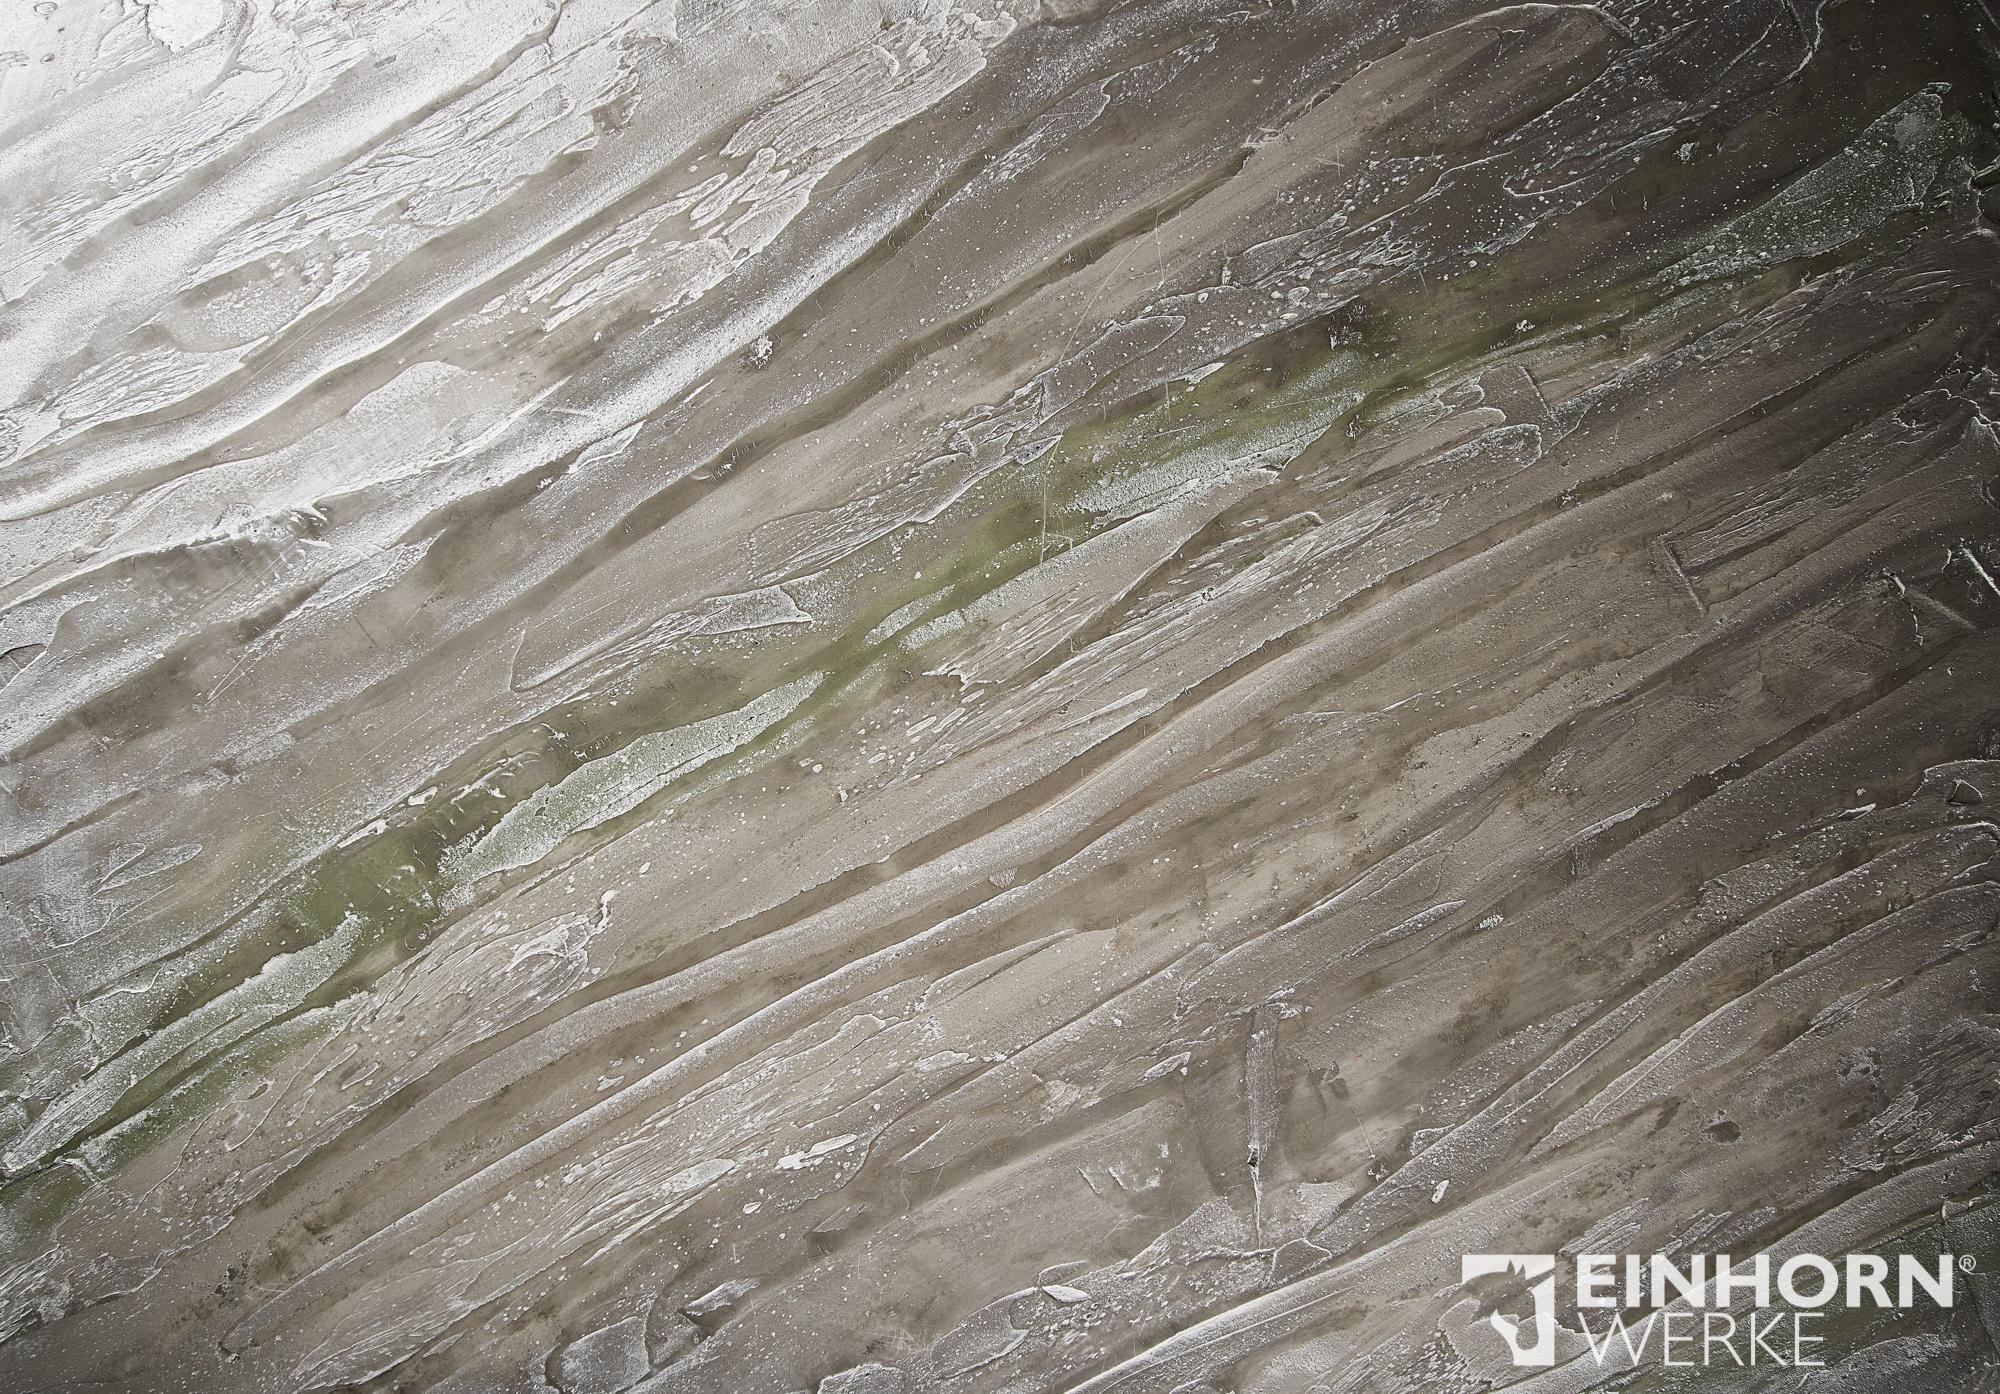 STUCCORINO 0905 + 0904 + 2406 + STUCCORINO Effect - Silber - edle Wohnzimmer Wände